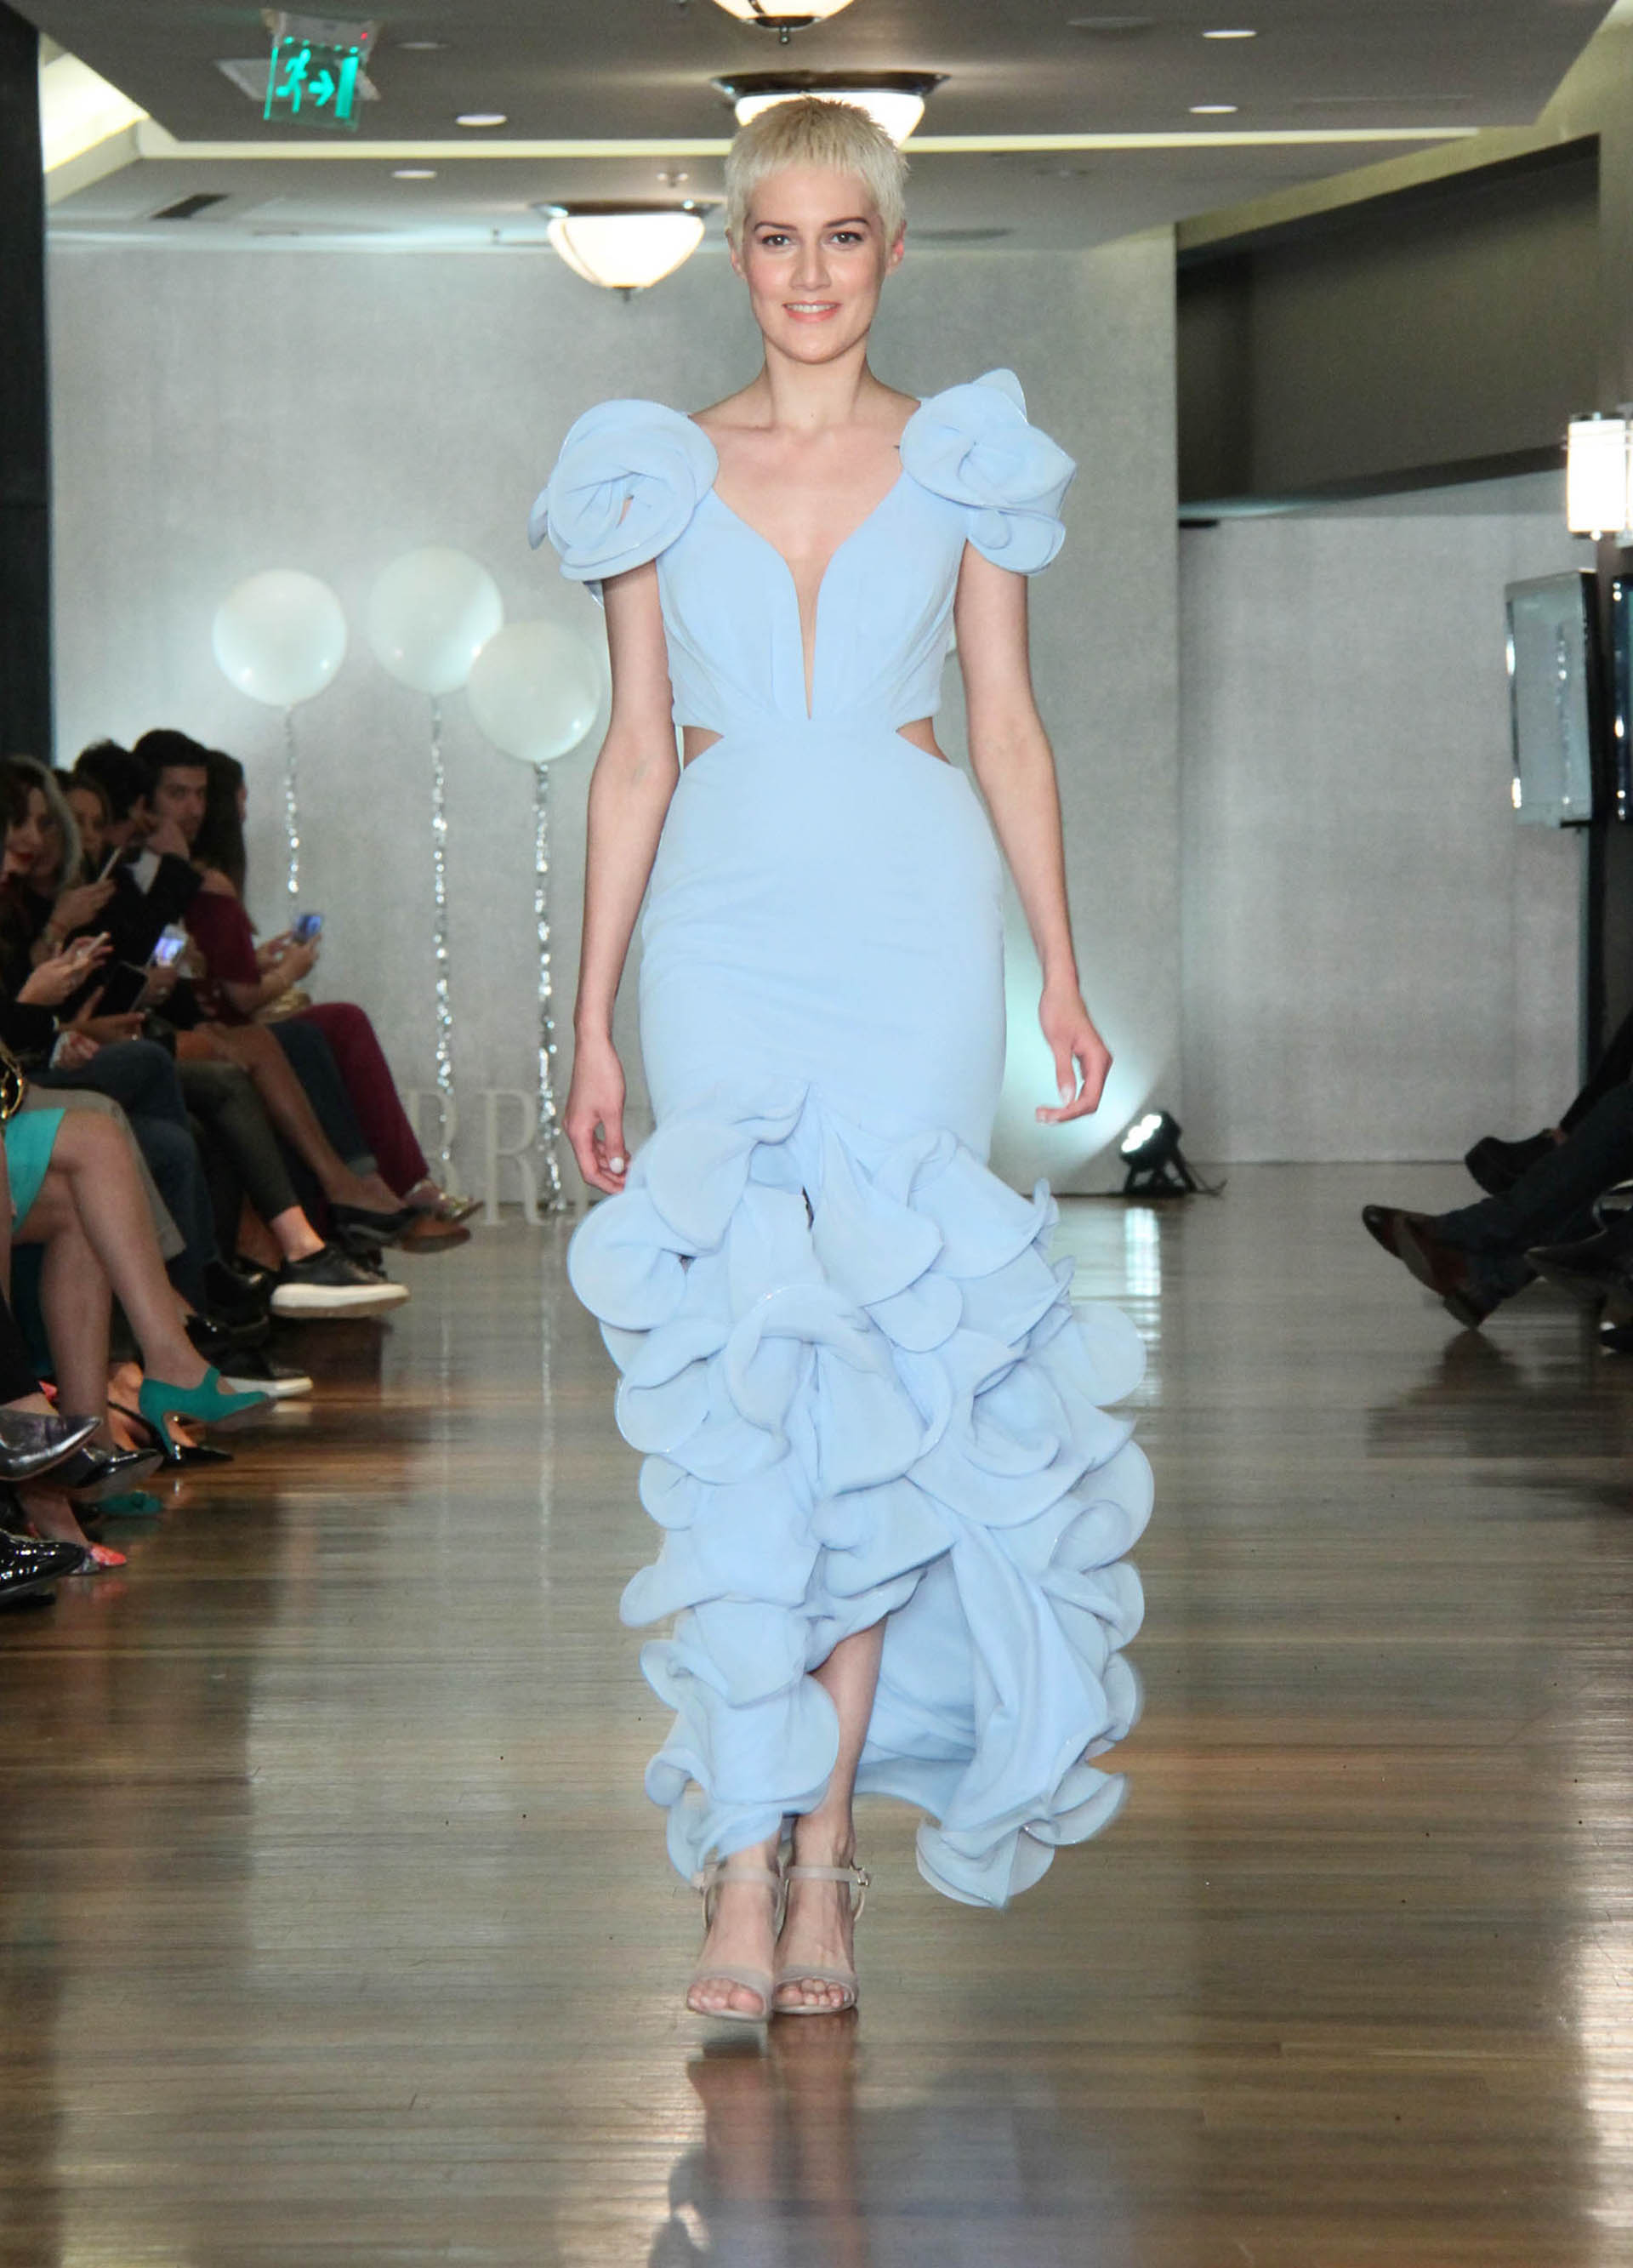 La modelo Laura Figueredo luciendo un espectacular vestido celeste pastel